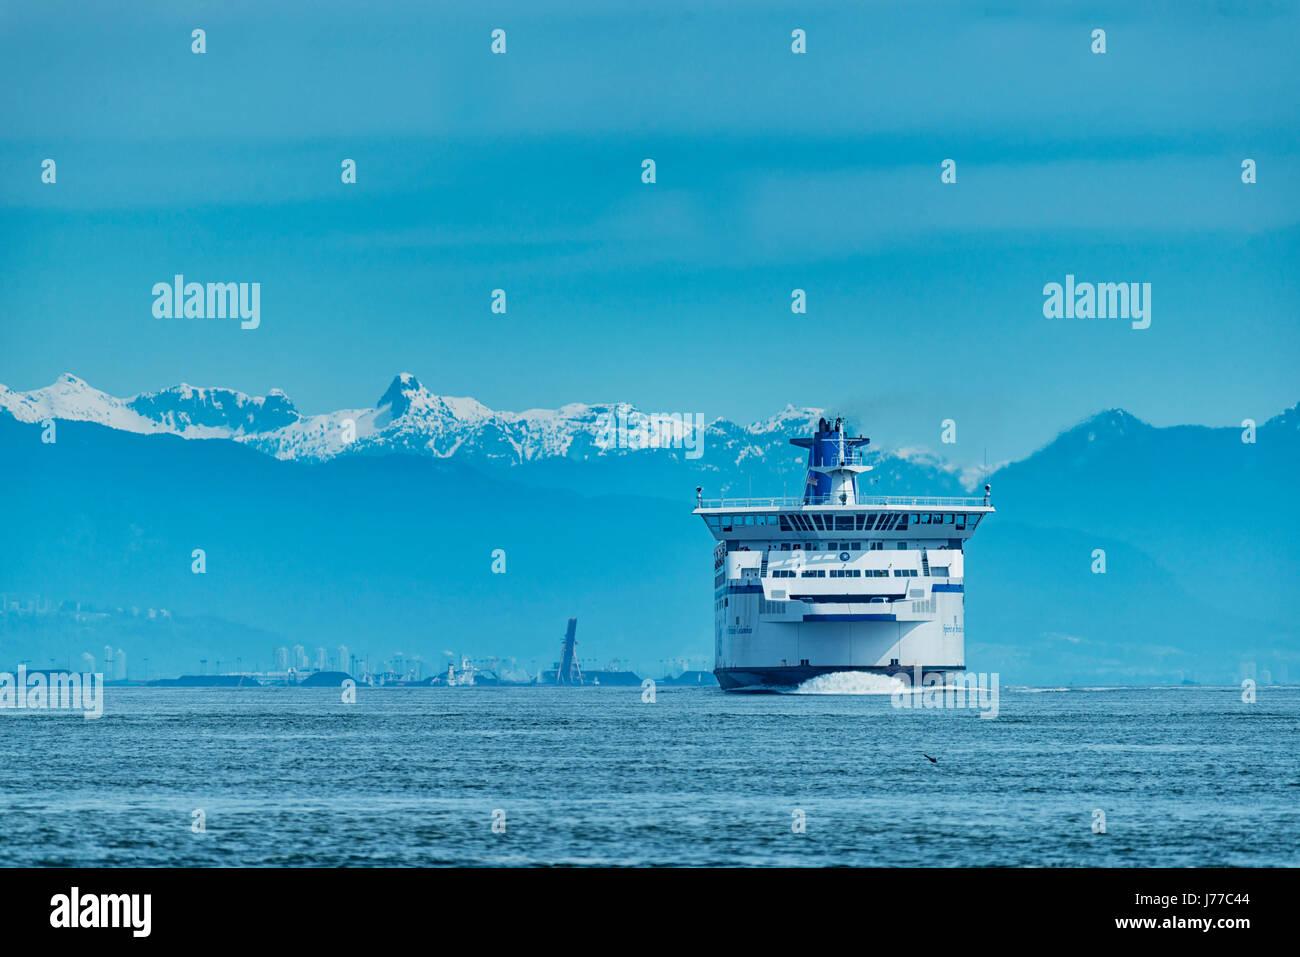 BC Ferries company passenger vessel Spirit of British Columbia sailing near to Galiano Island 2. - Stock Image